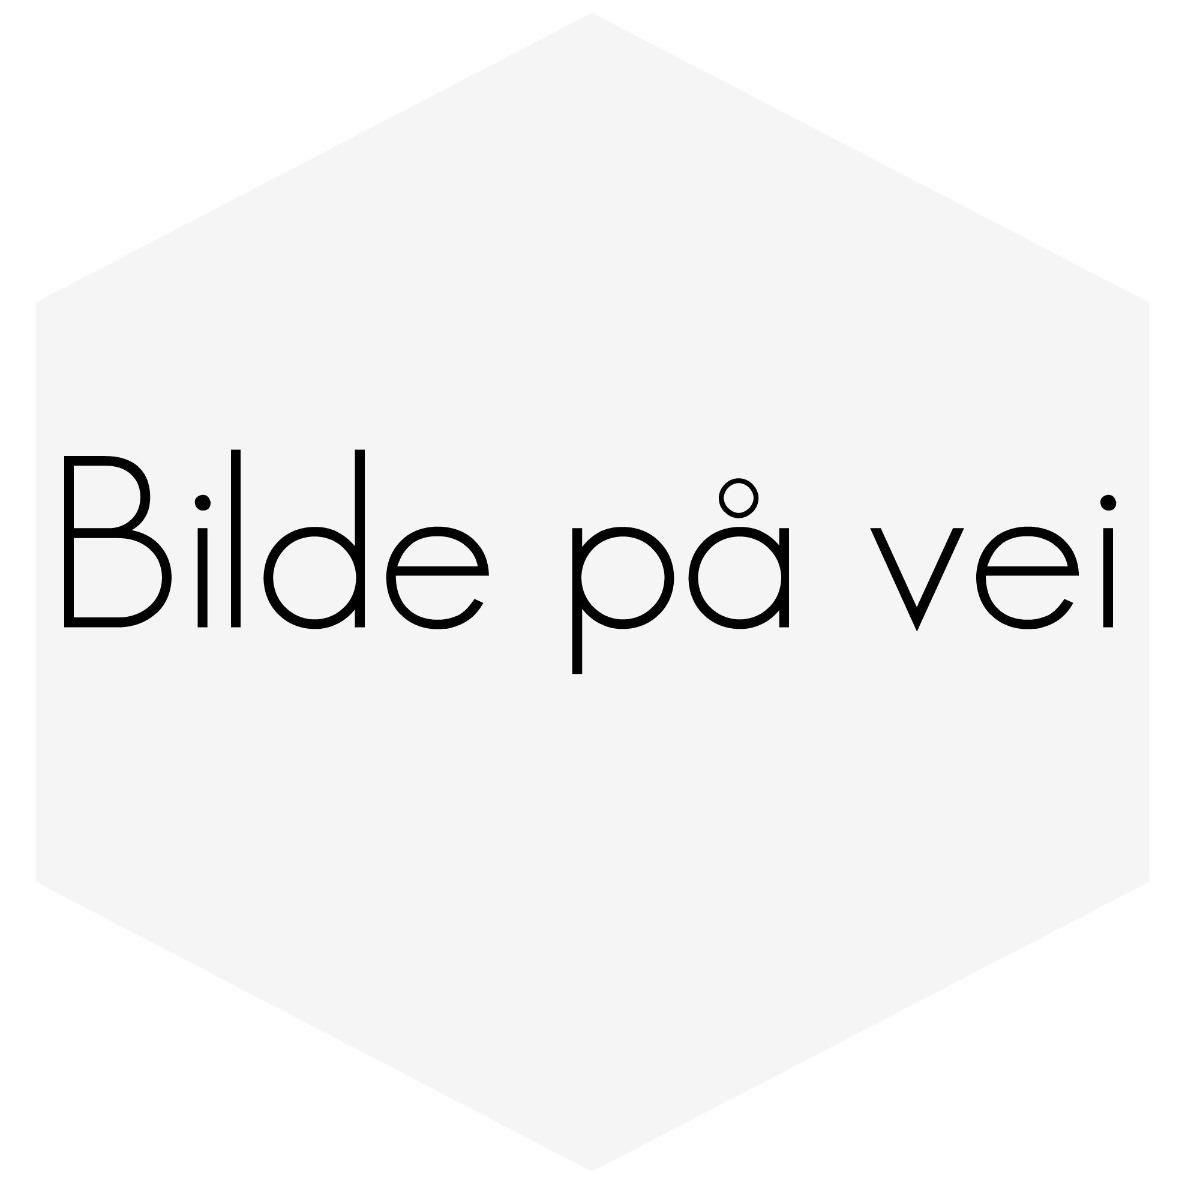 "SILIKONSLANGE RØD REDUSERING 1,25-1,375"" (32-35MM)"